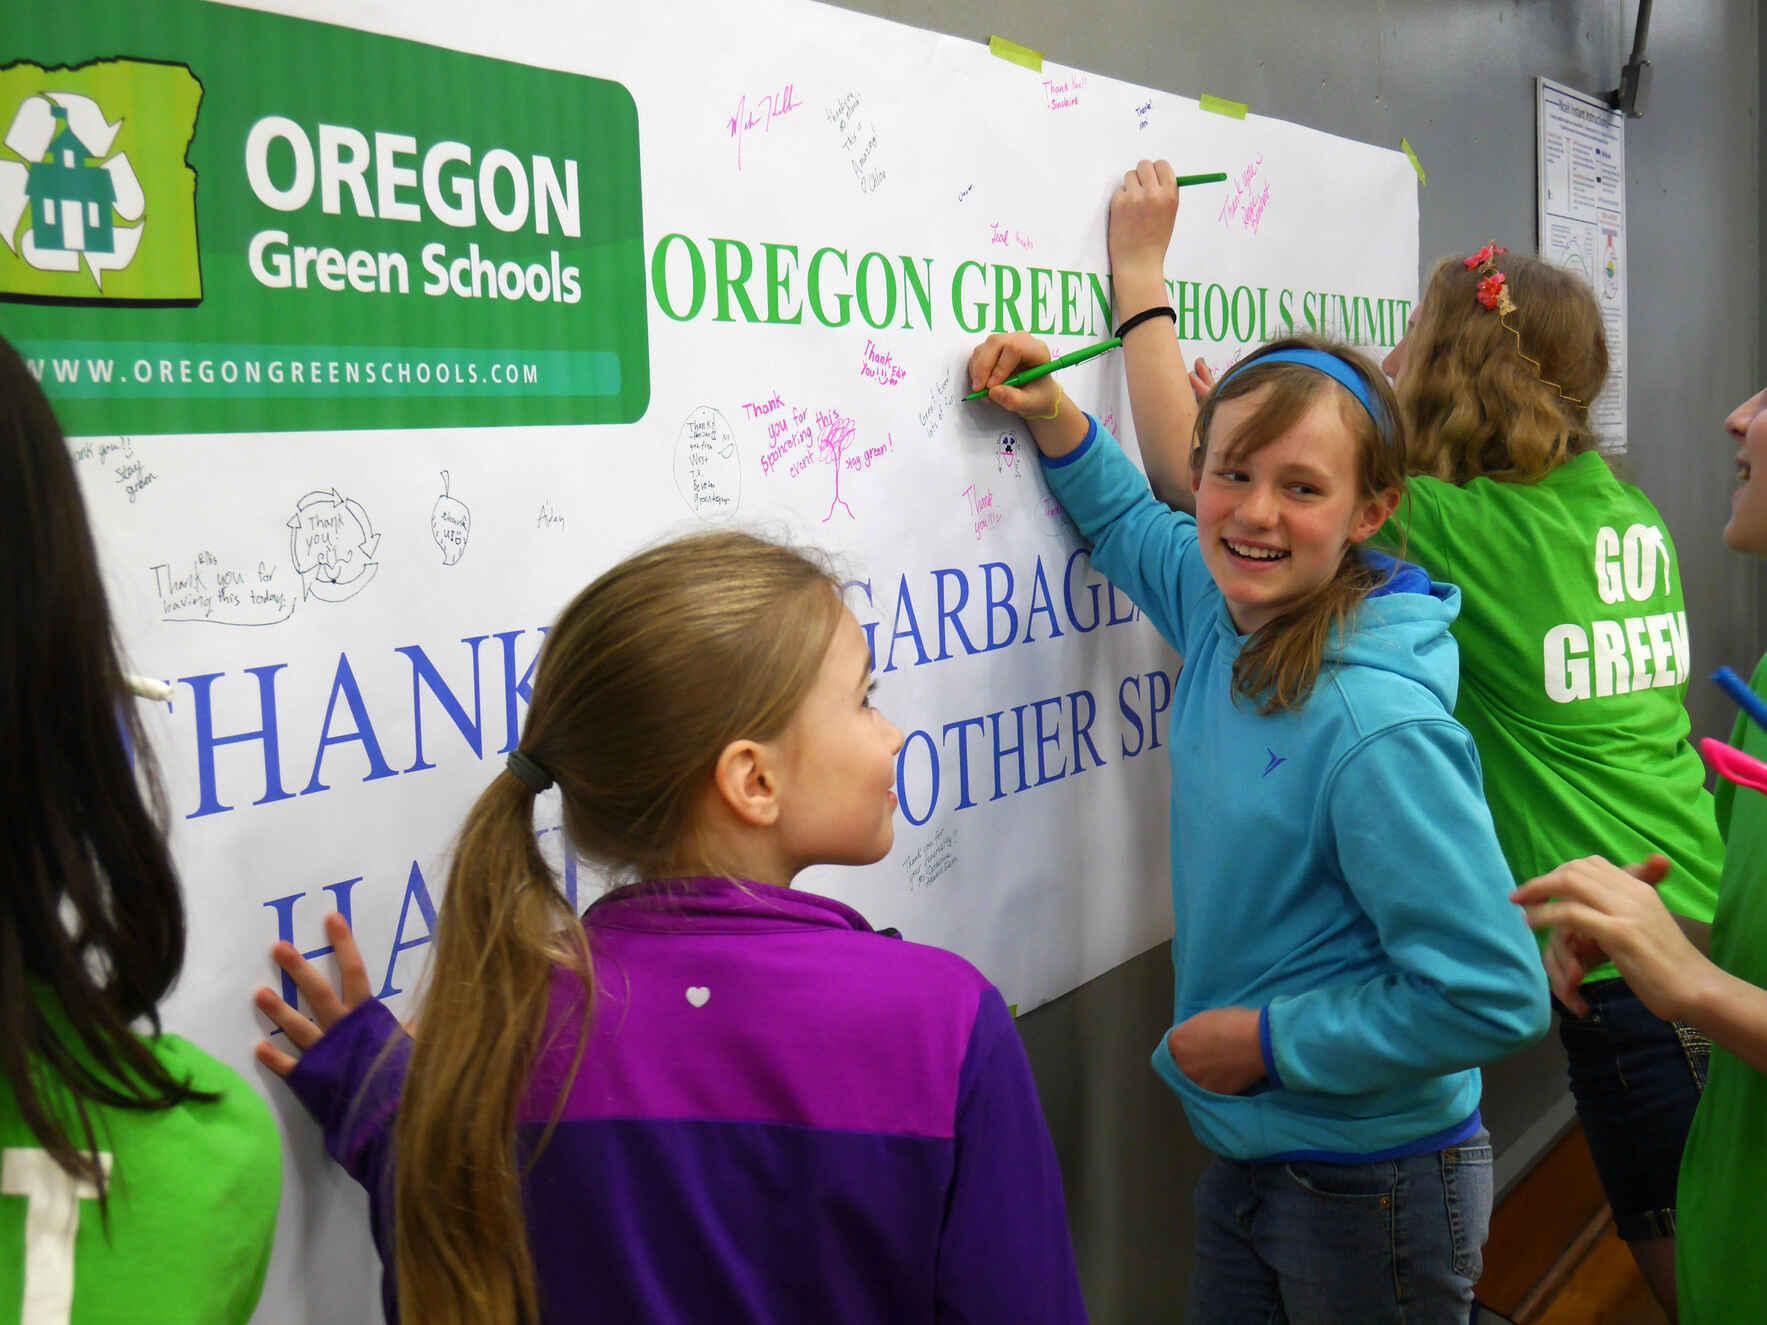 Support Oregon Green Schools image